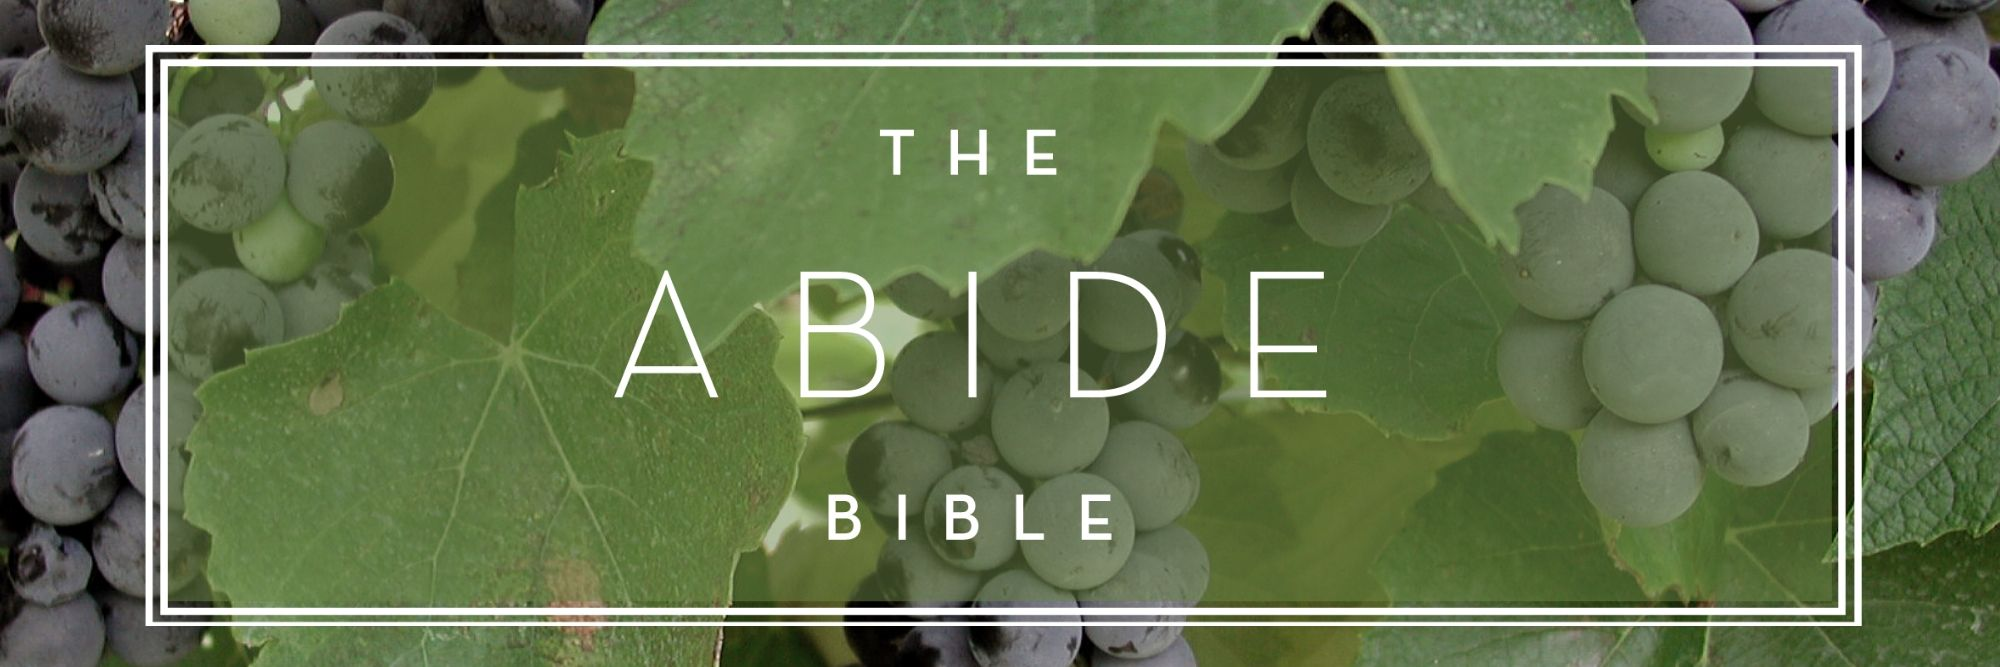 Abide-Bible